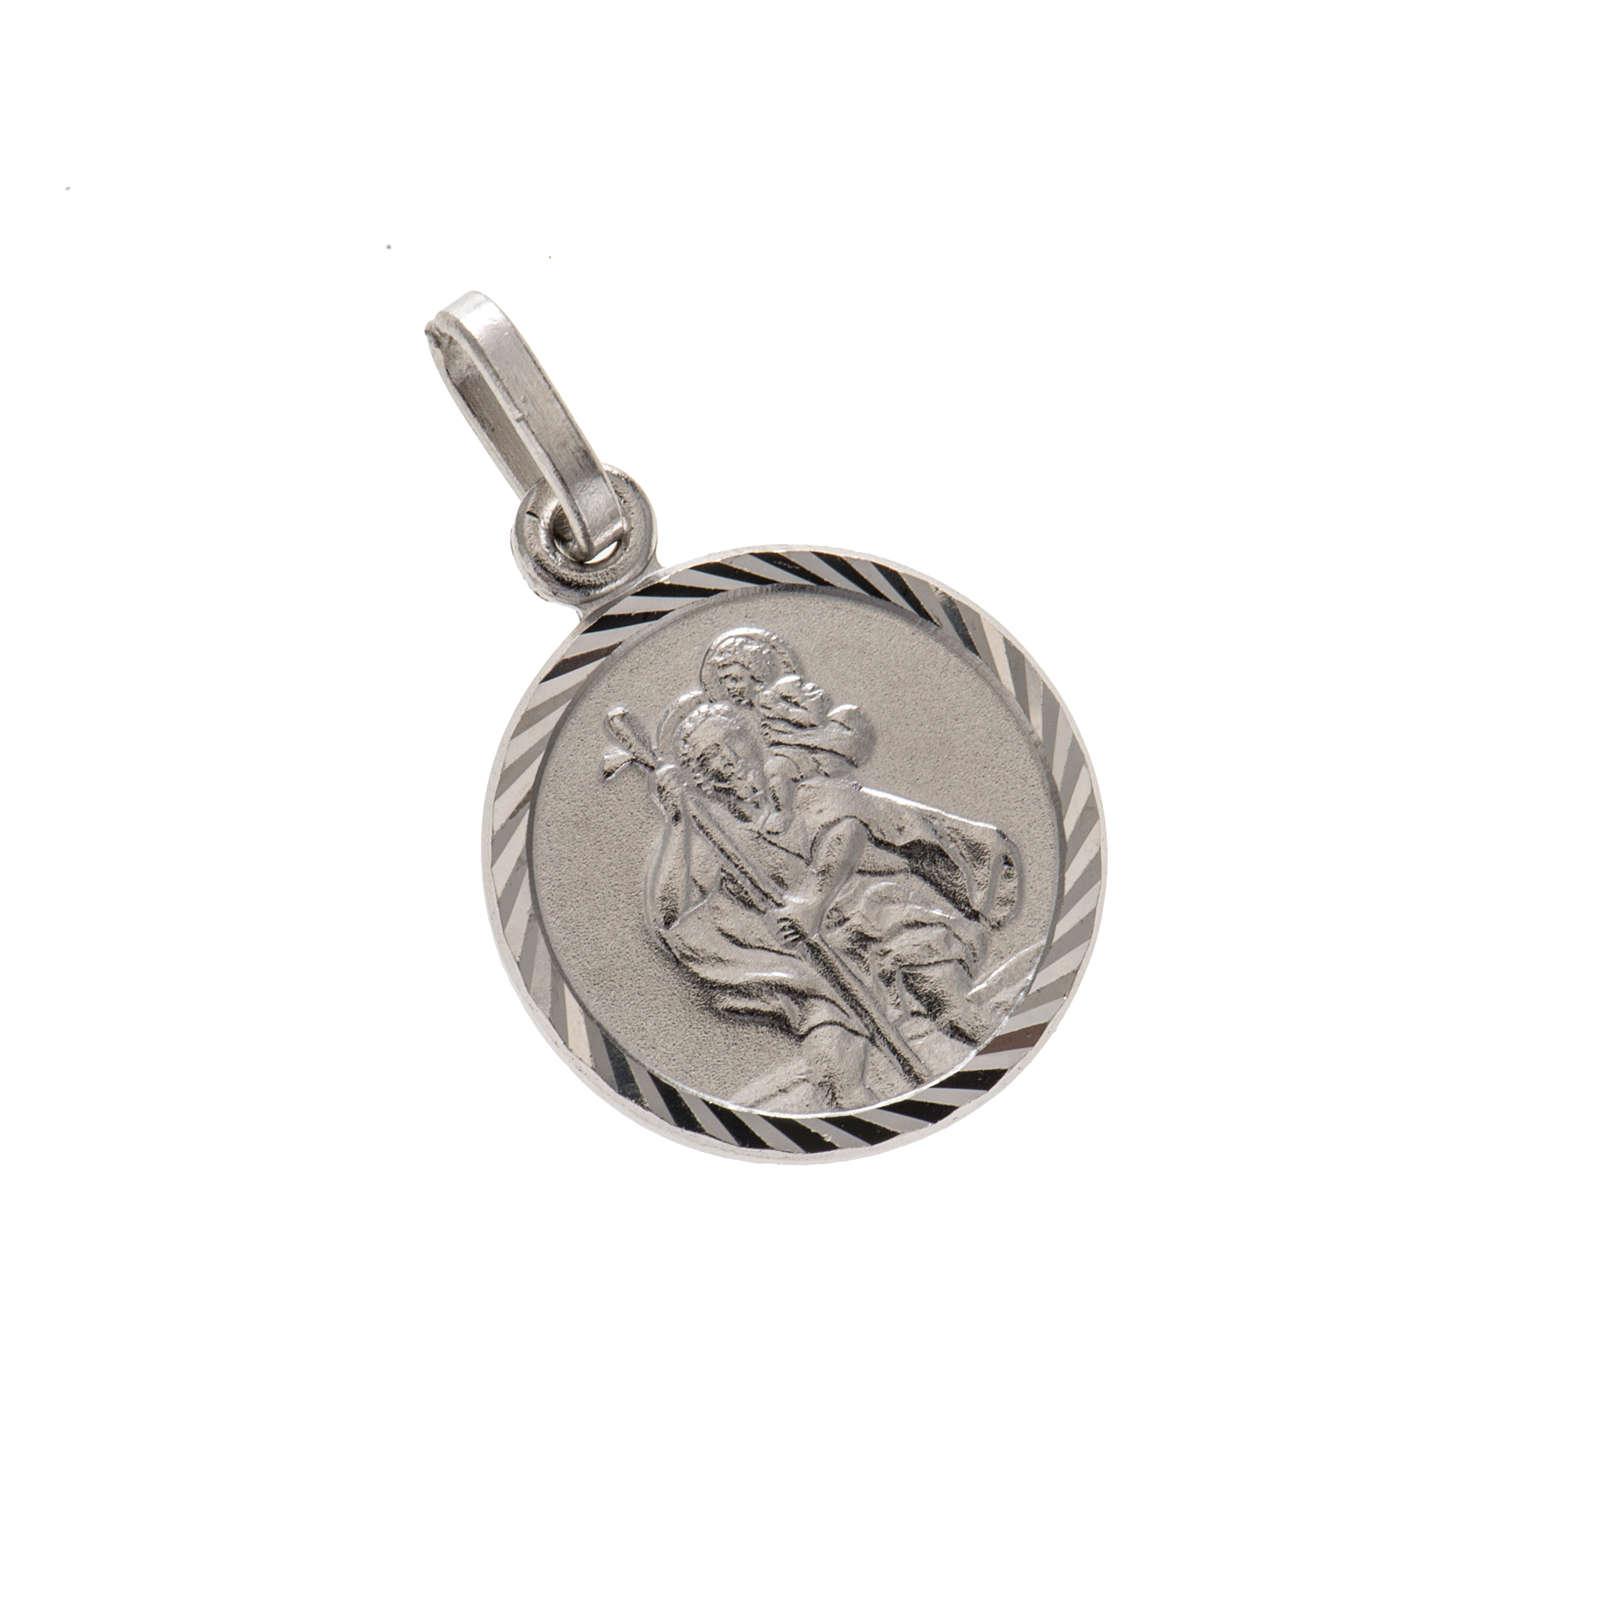 Runde Medaille Silber 925 Sankt Christophorus 1,5 cm 4